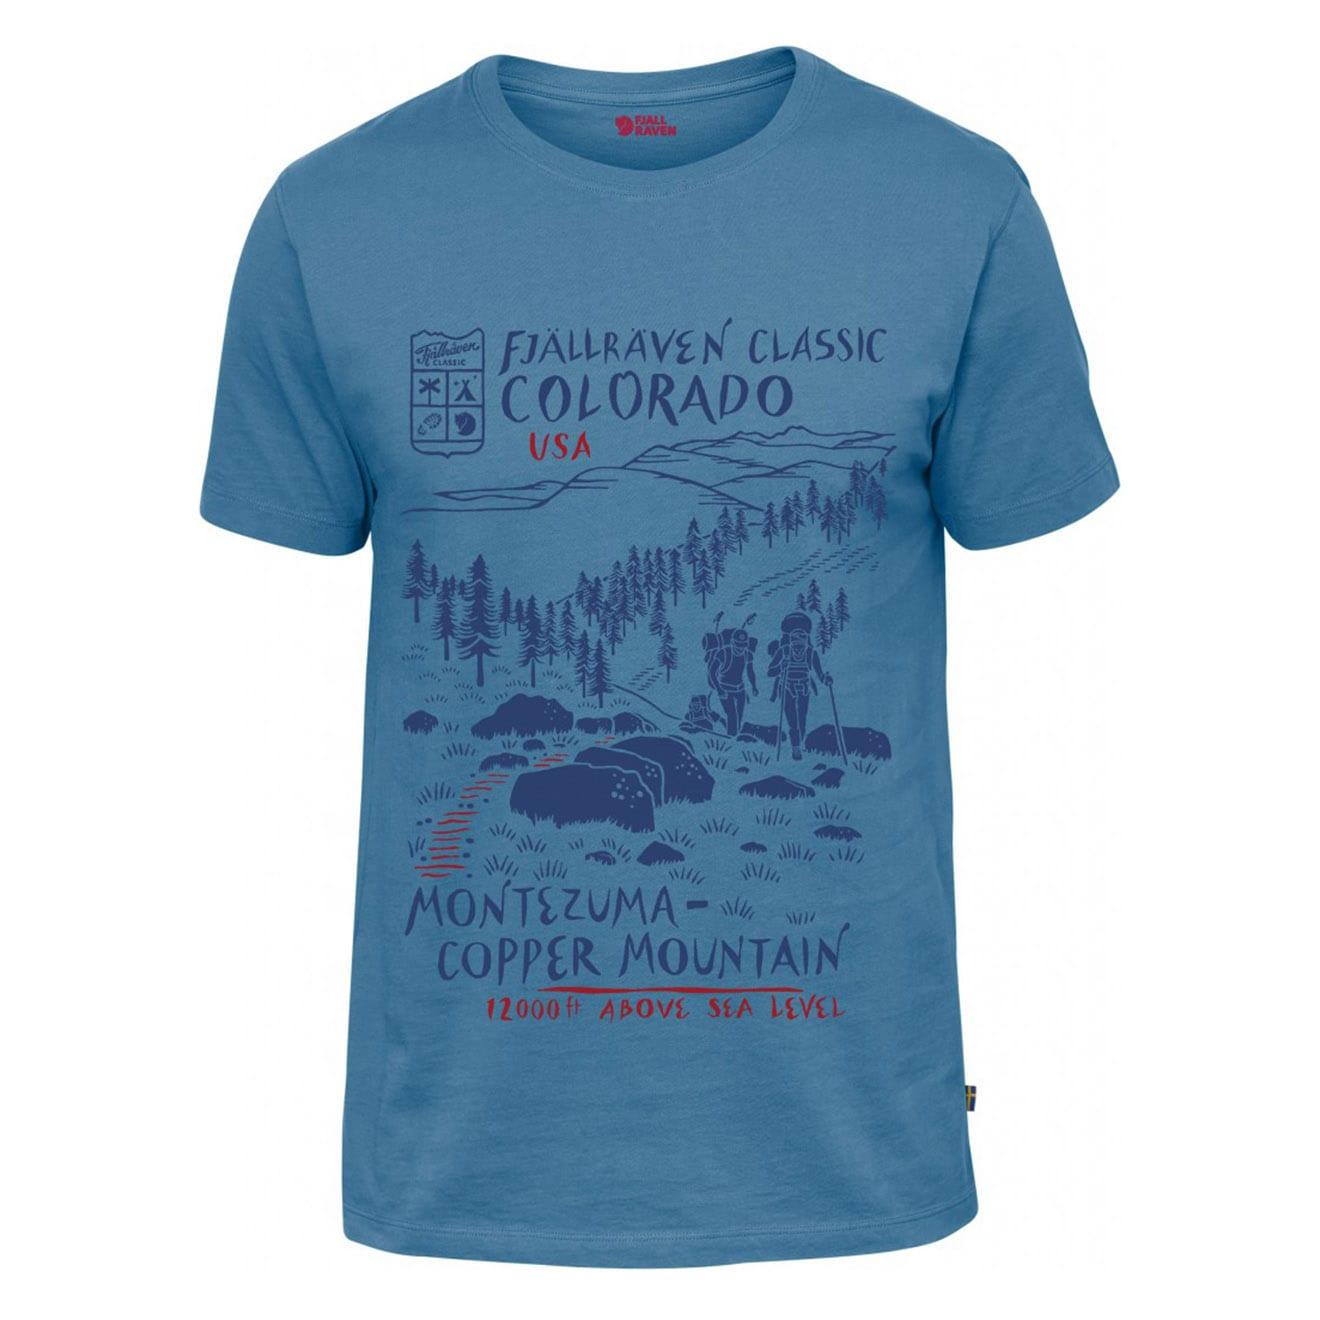 Fjallraven Classic US T-Shirt US Azure Blue